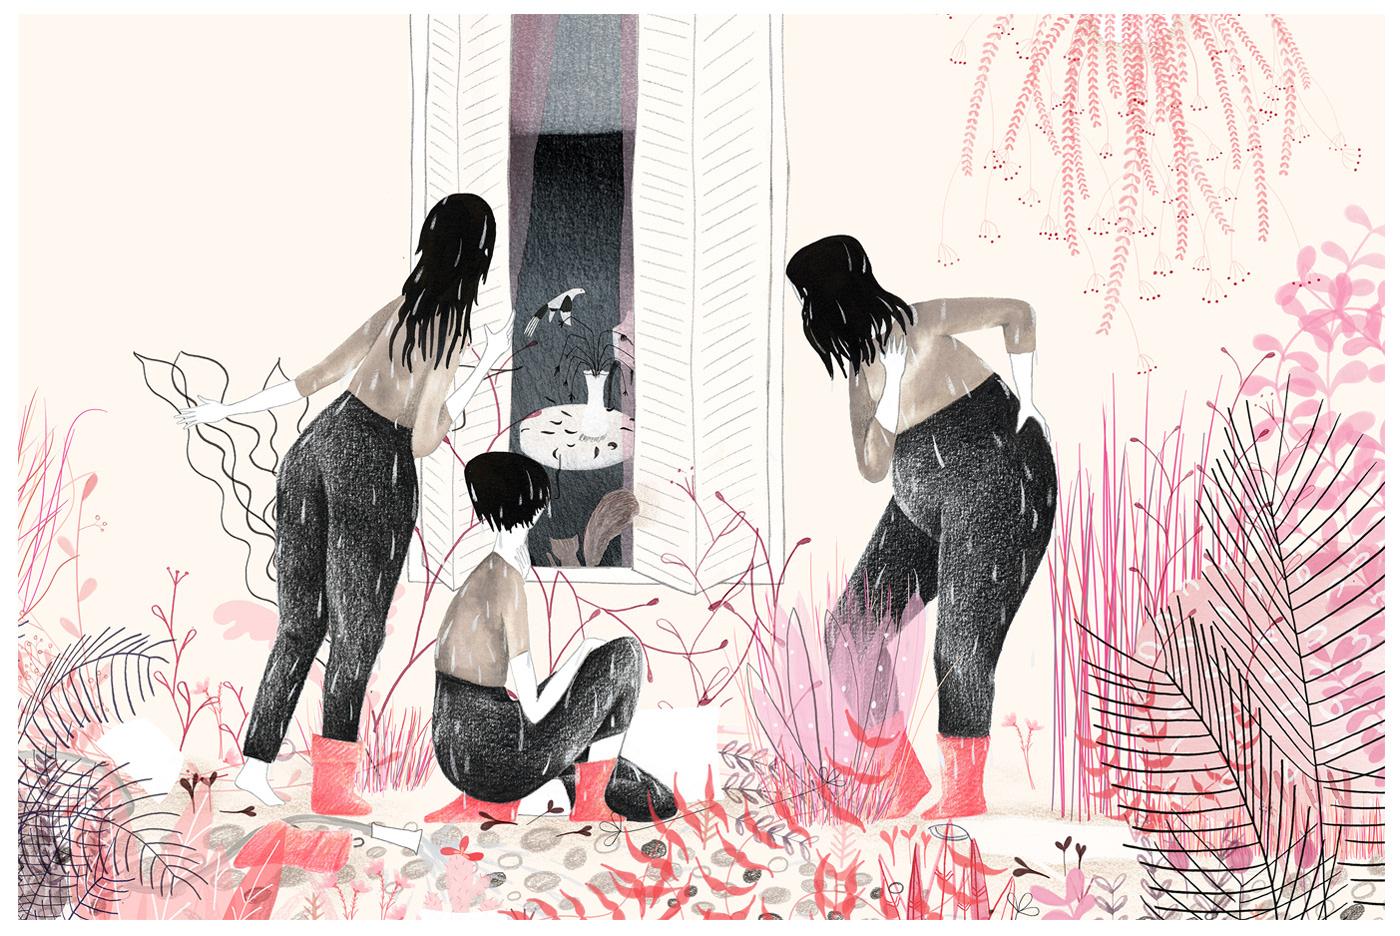 illustracion ILLUSTRATION  women Mujeres jardin garden pink sharjah Exhibition